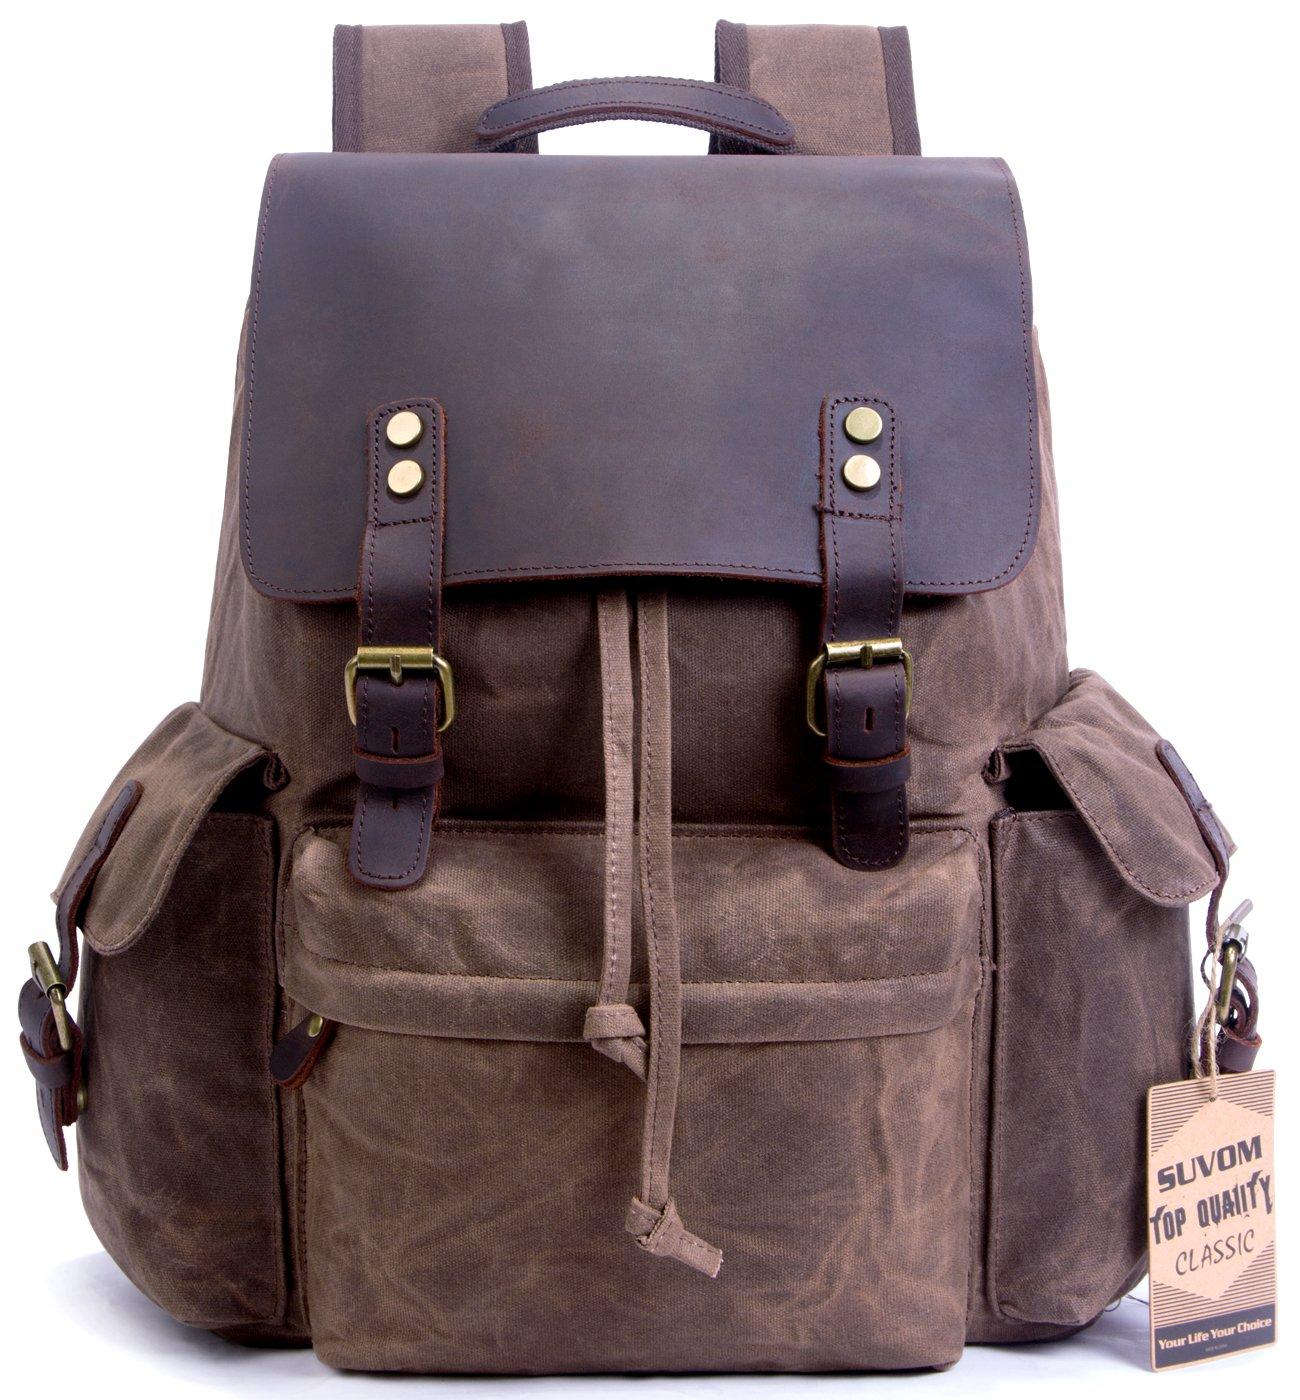 SUVOM Vintage Canvas Leather Laptop Backpack for Men School Bag 15.6'' Waterproof Travel Rucksack (Coffee)